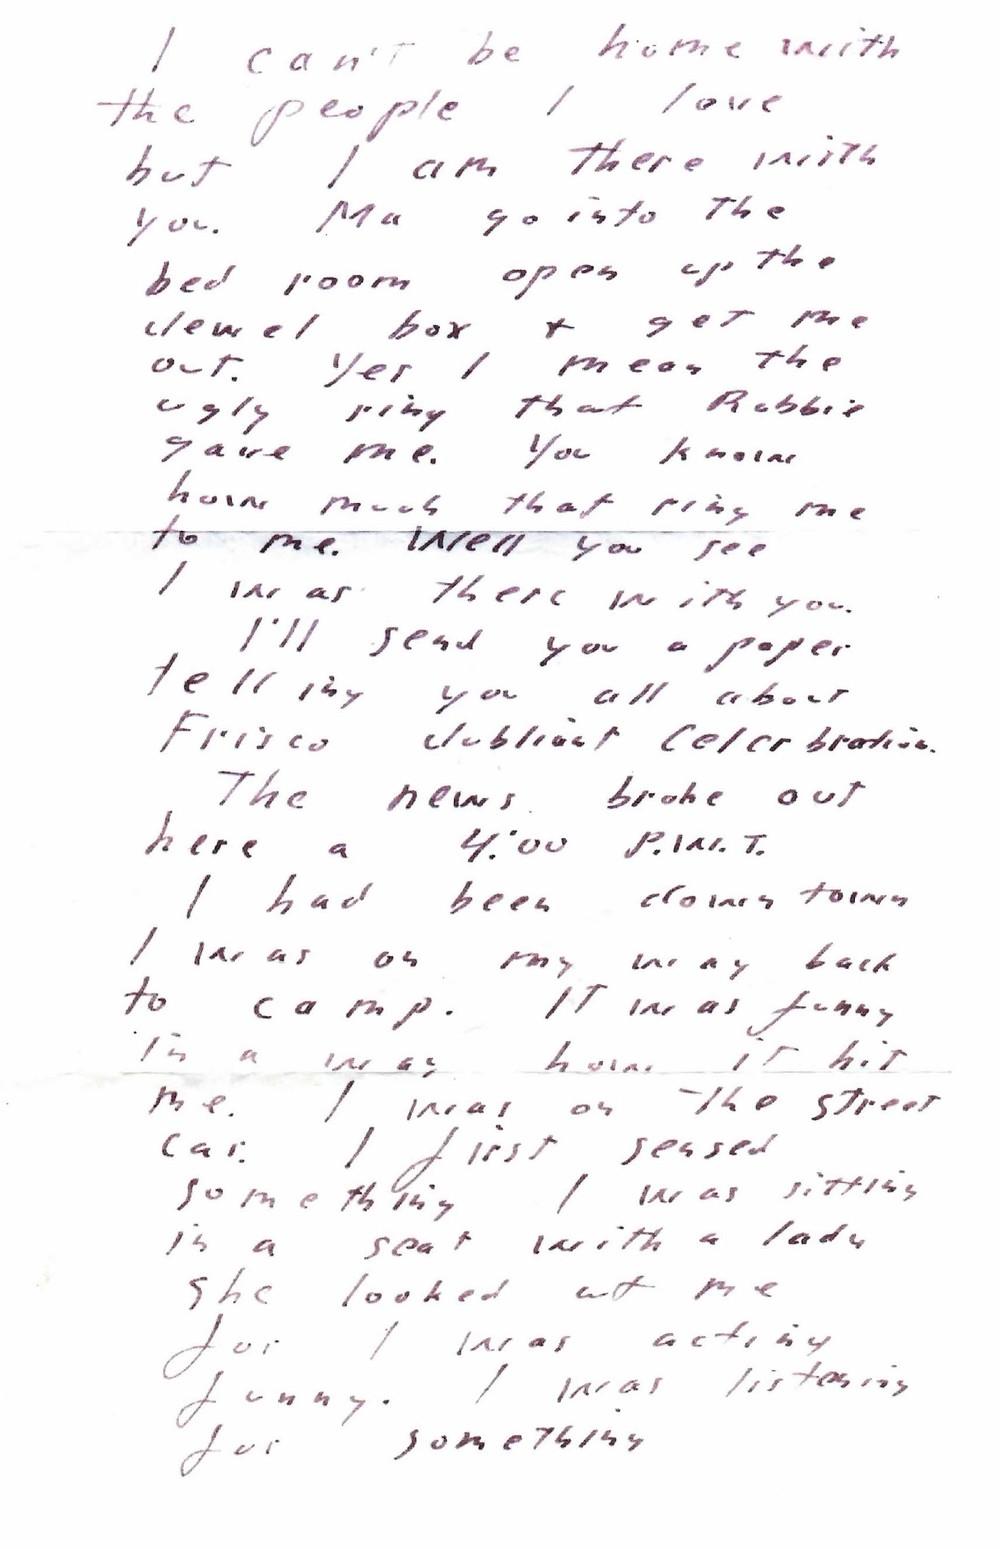 Daddy's letter VJ Day San Fransisco 005.jpg